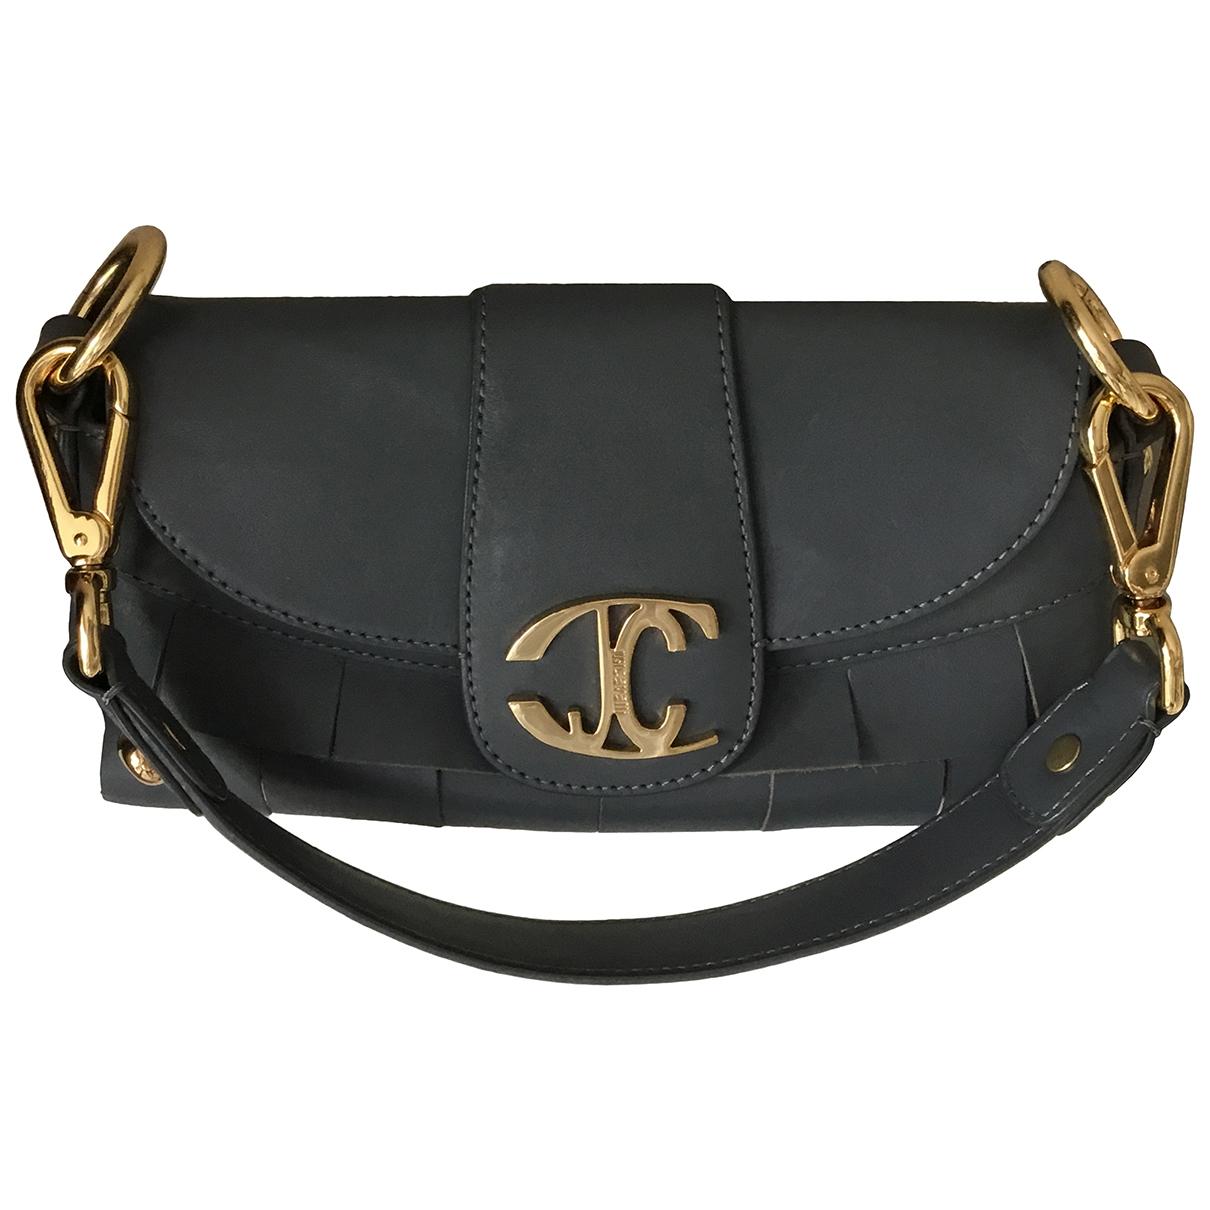 Just Cavalli \N Grey Leather Clutch bag for Women \N